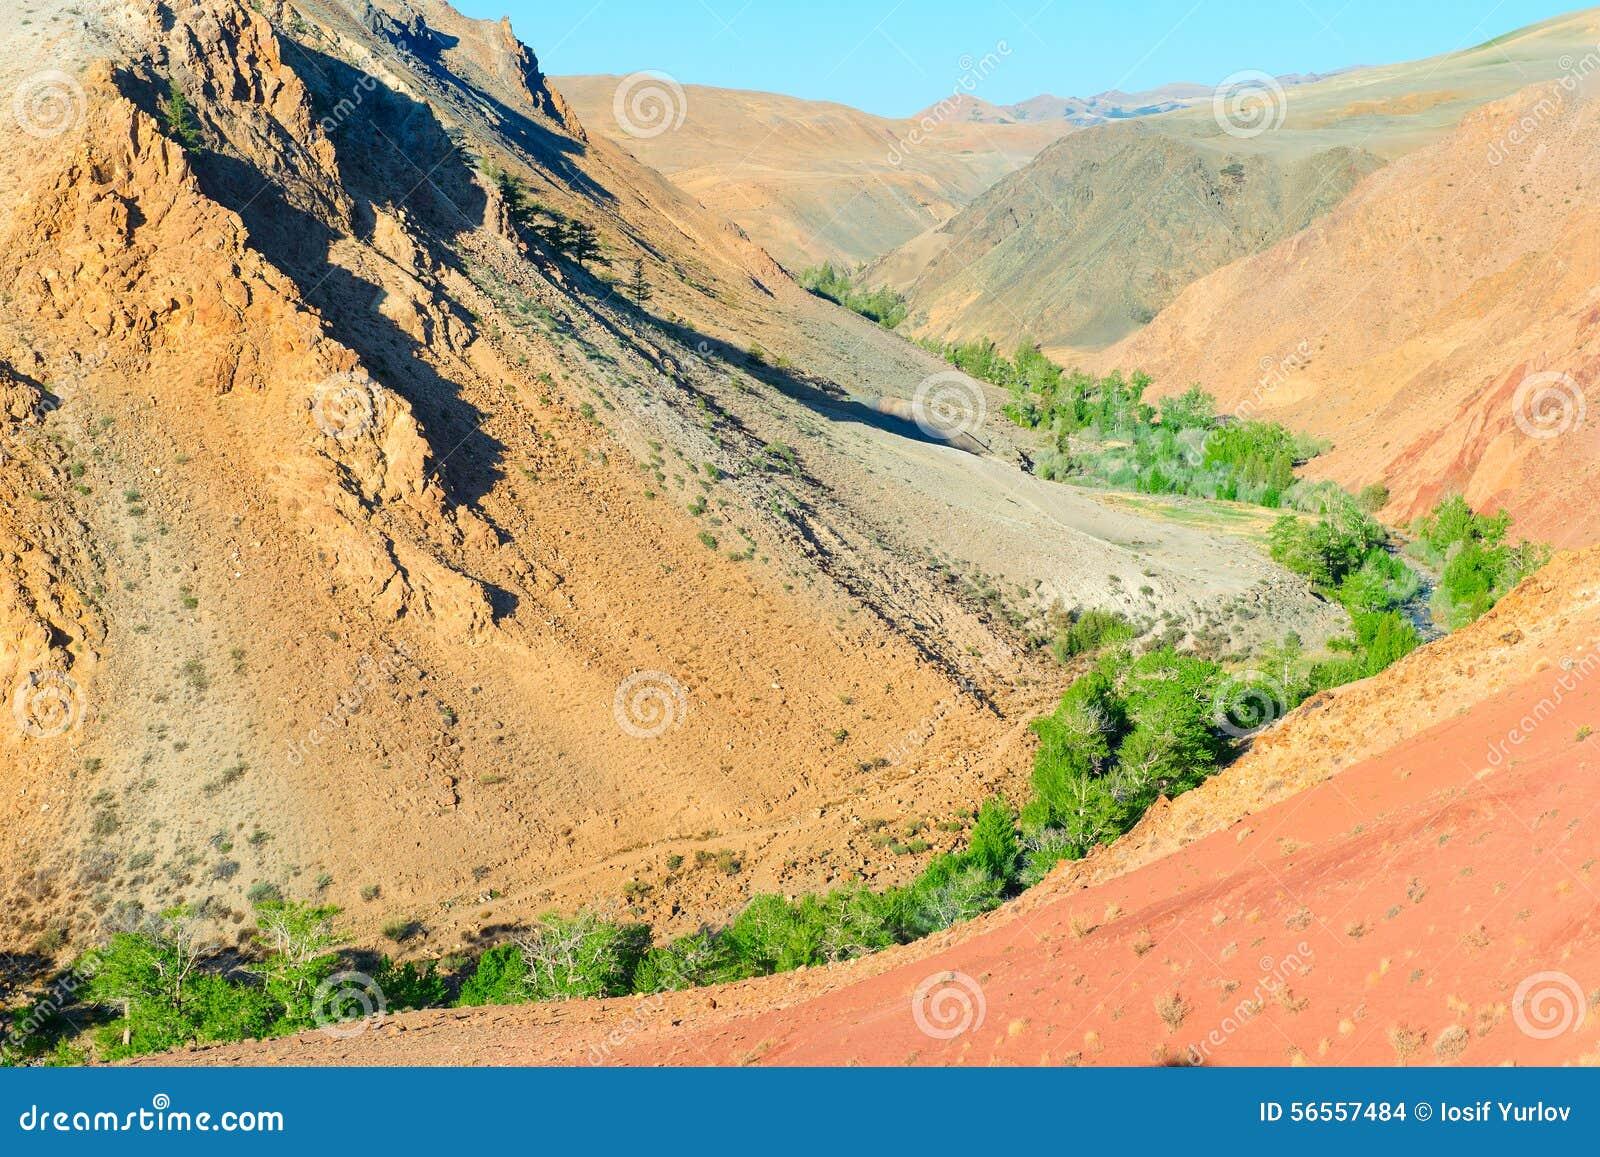 Download Χώμα χρώματος των καταθέσεων υδραργύρου σε Altai Στοκ Εικόνες - εικόνα από χώρα, φύση: 56557484